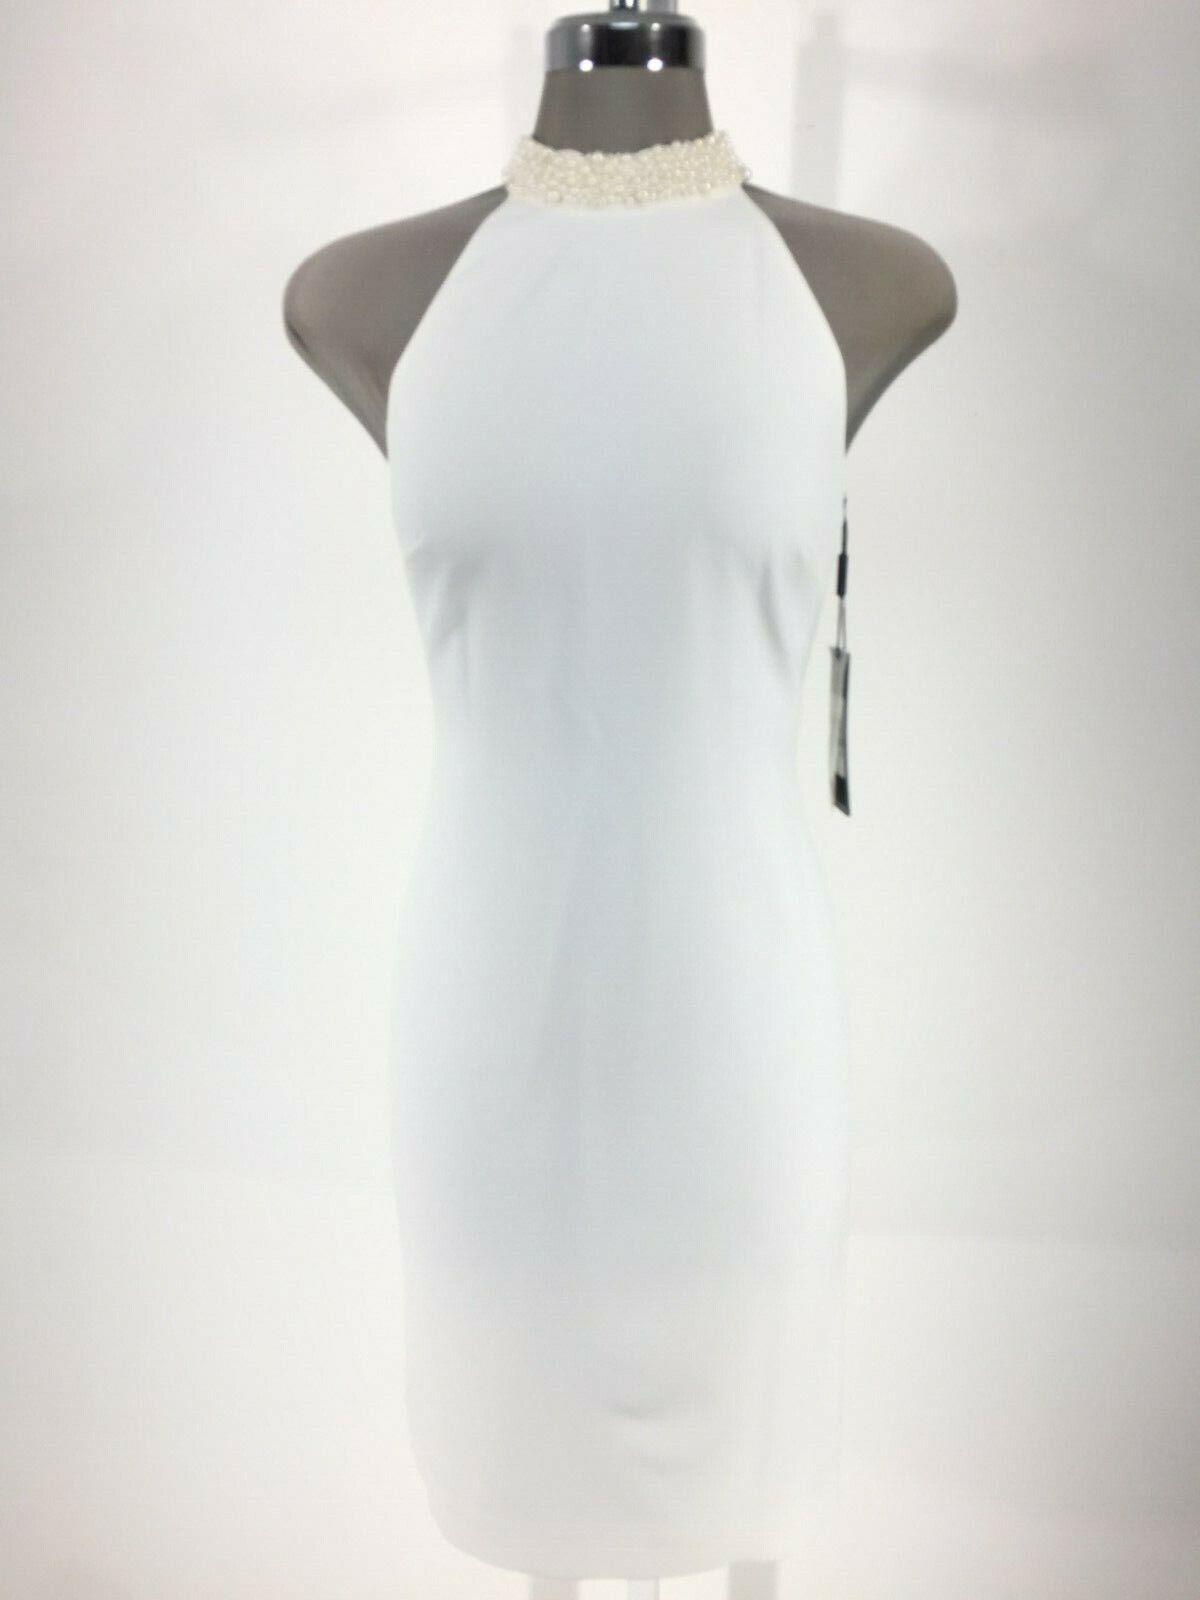 Karl Lagerfeld Neu Eleganz @ Its Best Elfenbein Pearl-Bead Etuikleid 0,2,4,8